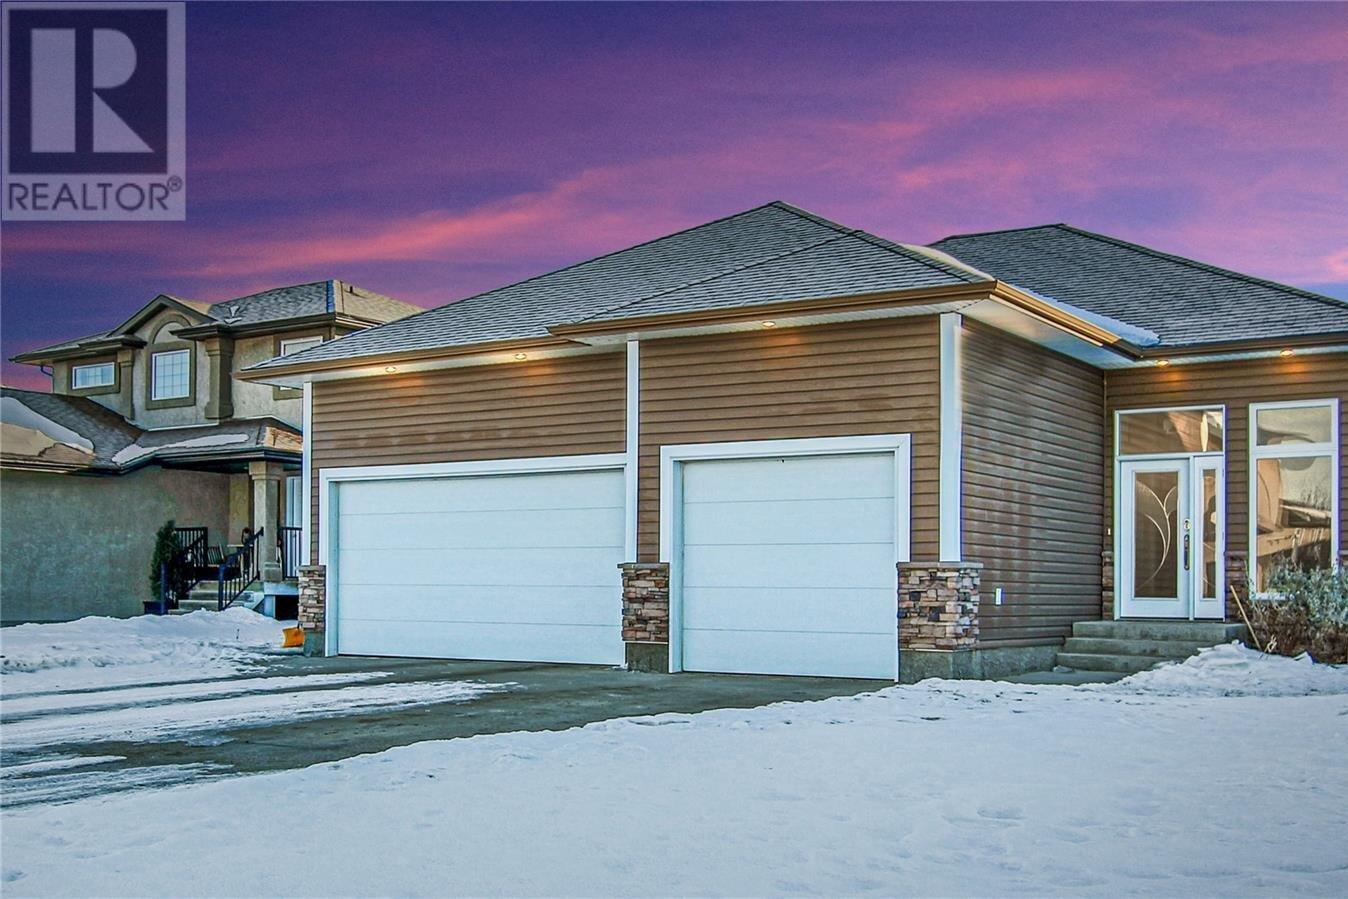 House for sale at 65 Fairway Cres White City Saskatchewan - MLS: SK837498